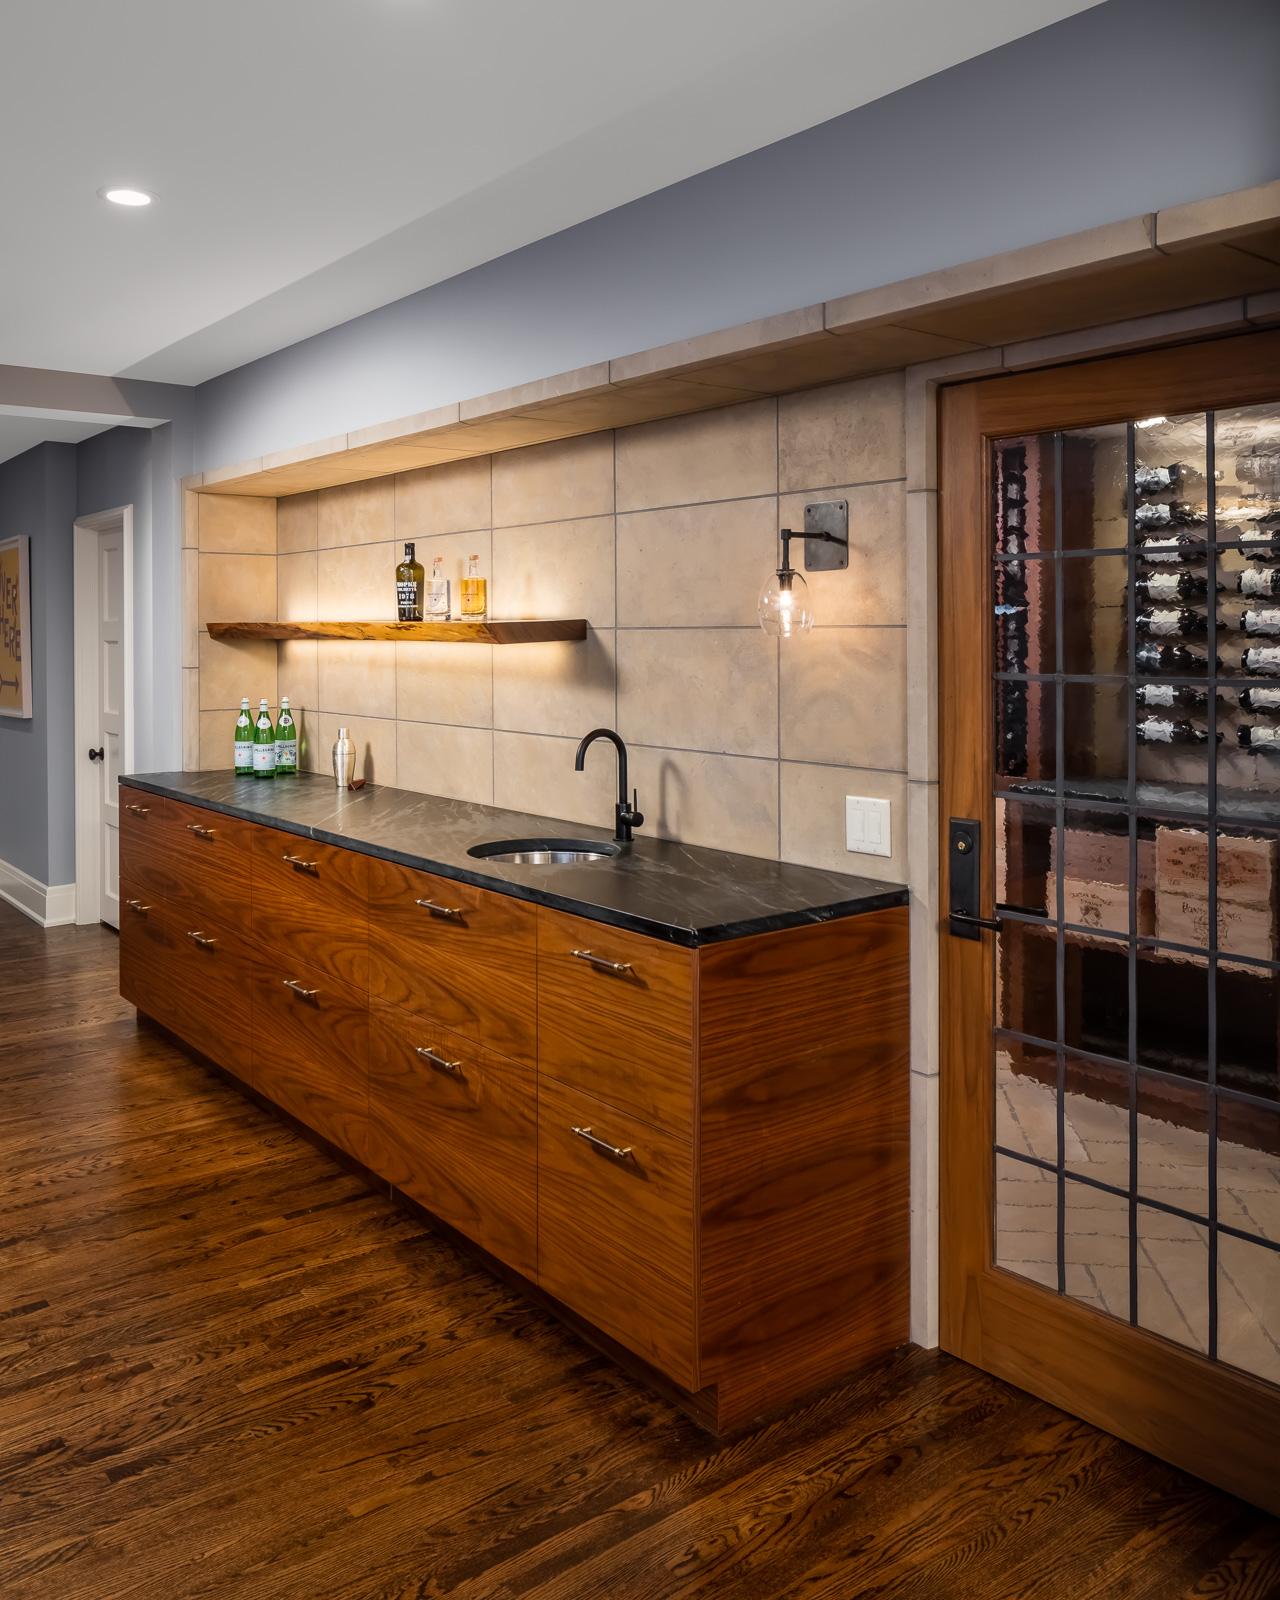 Bar installed / Entrance into wine cellar